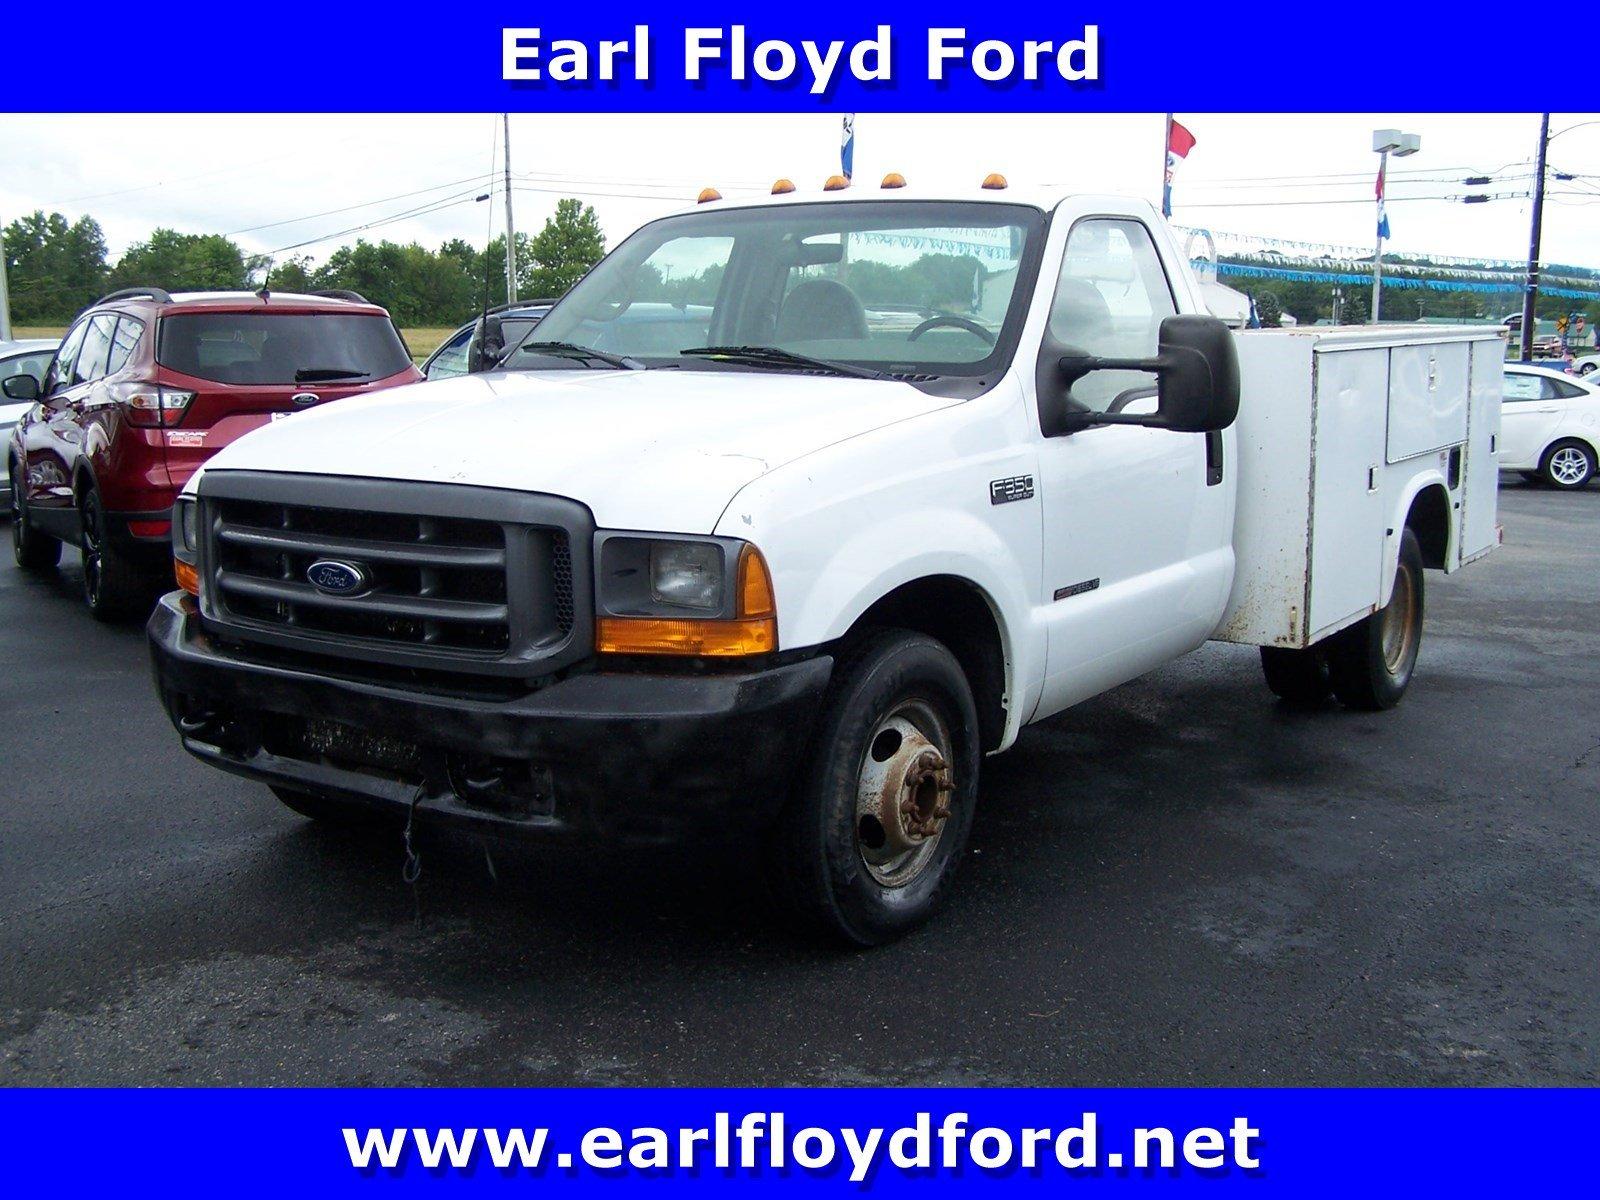 2000 Ford Super Duty F-350 DRW XL Truck Regular Cab